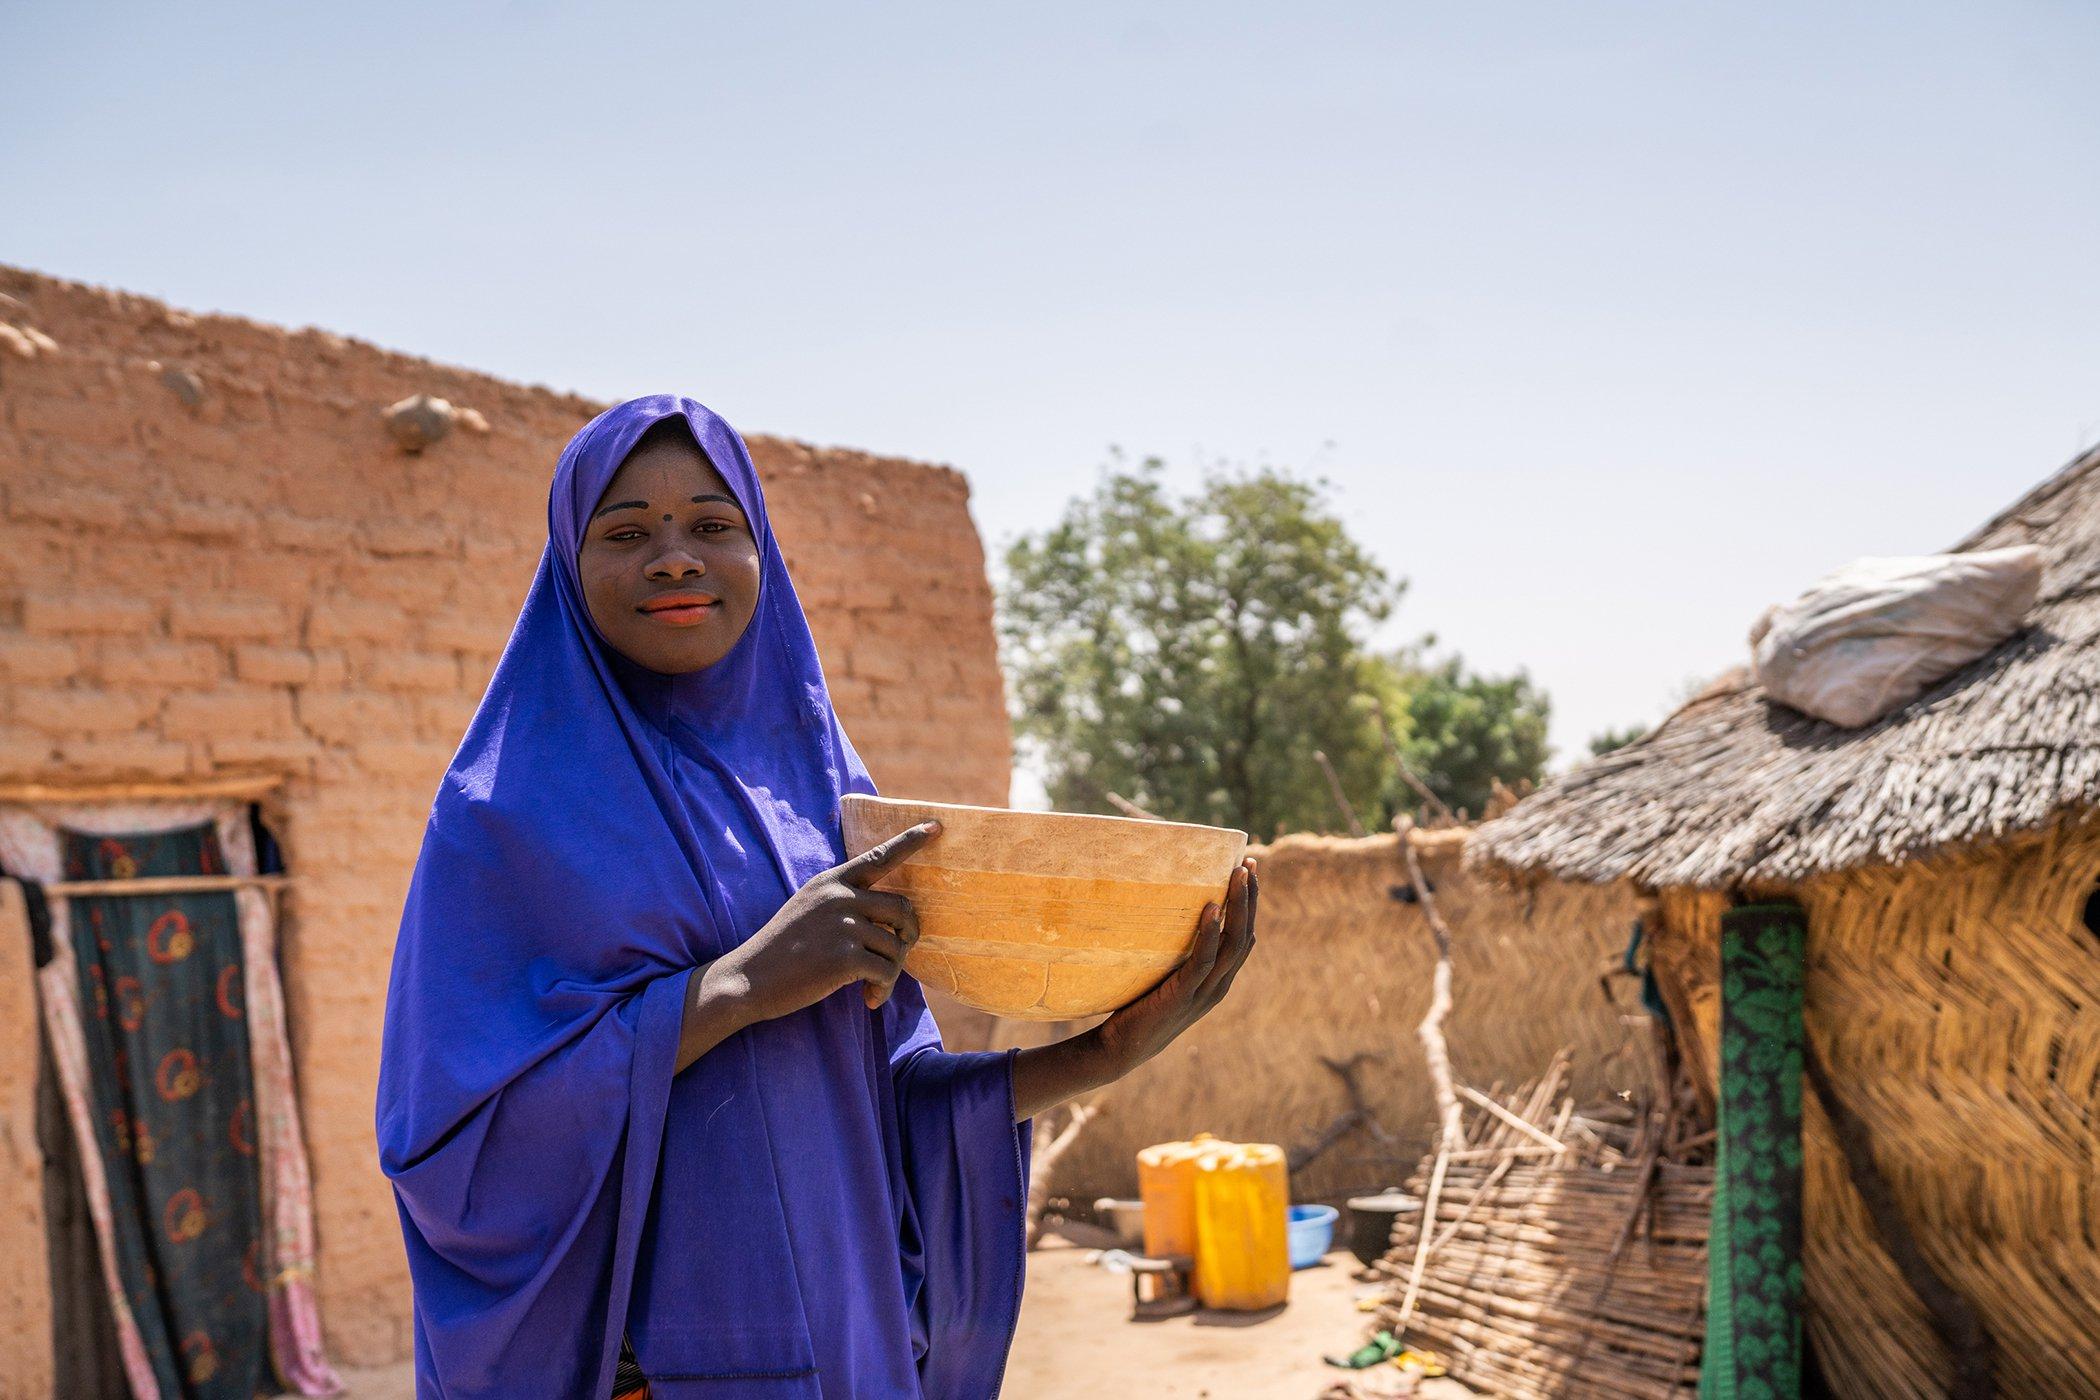 UNICEF-Child-Marriage-Report-COVID-19-002.jpg